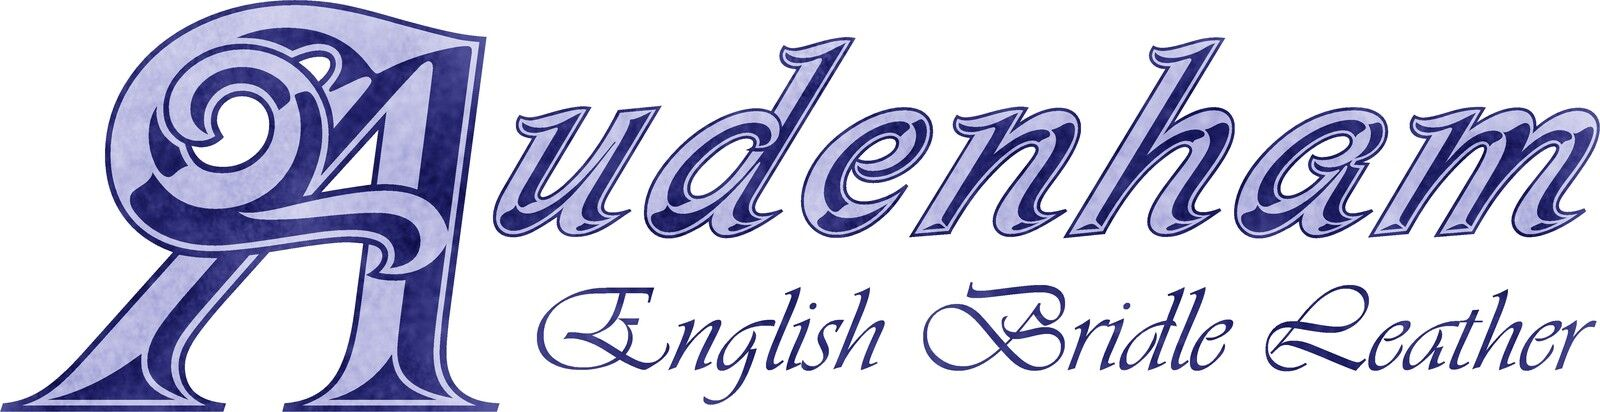 Audenham Braun English Bridle Leder Laced Handcrafted / Horse Reins 19mm / Handcrafted 3/4